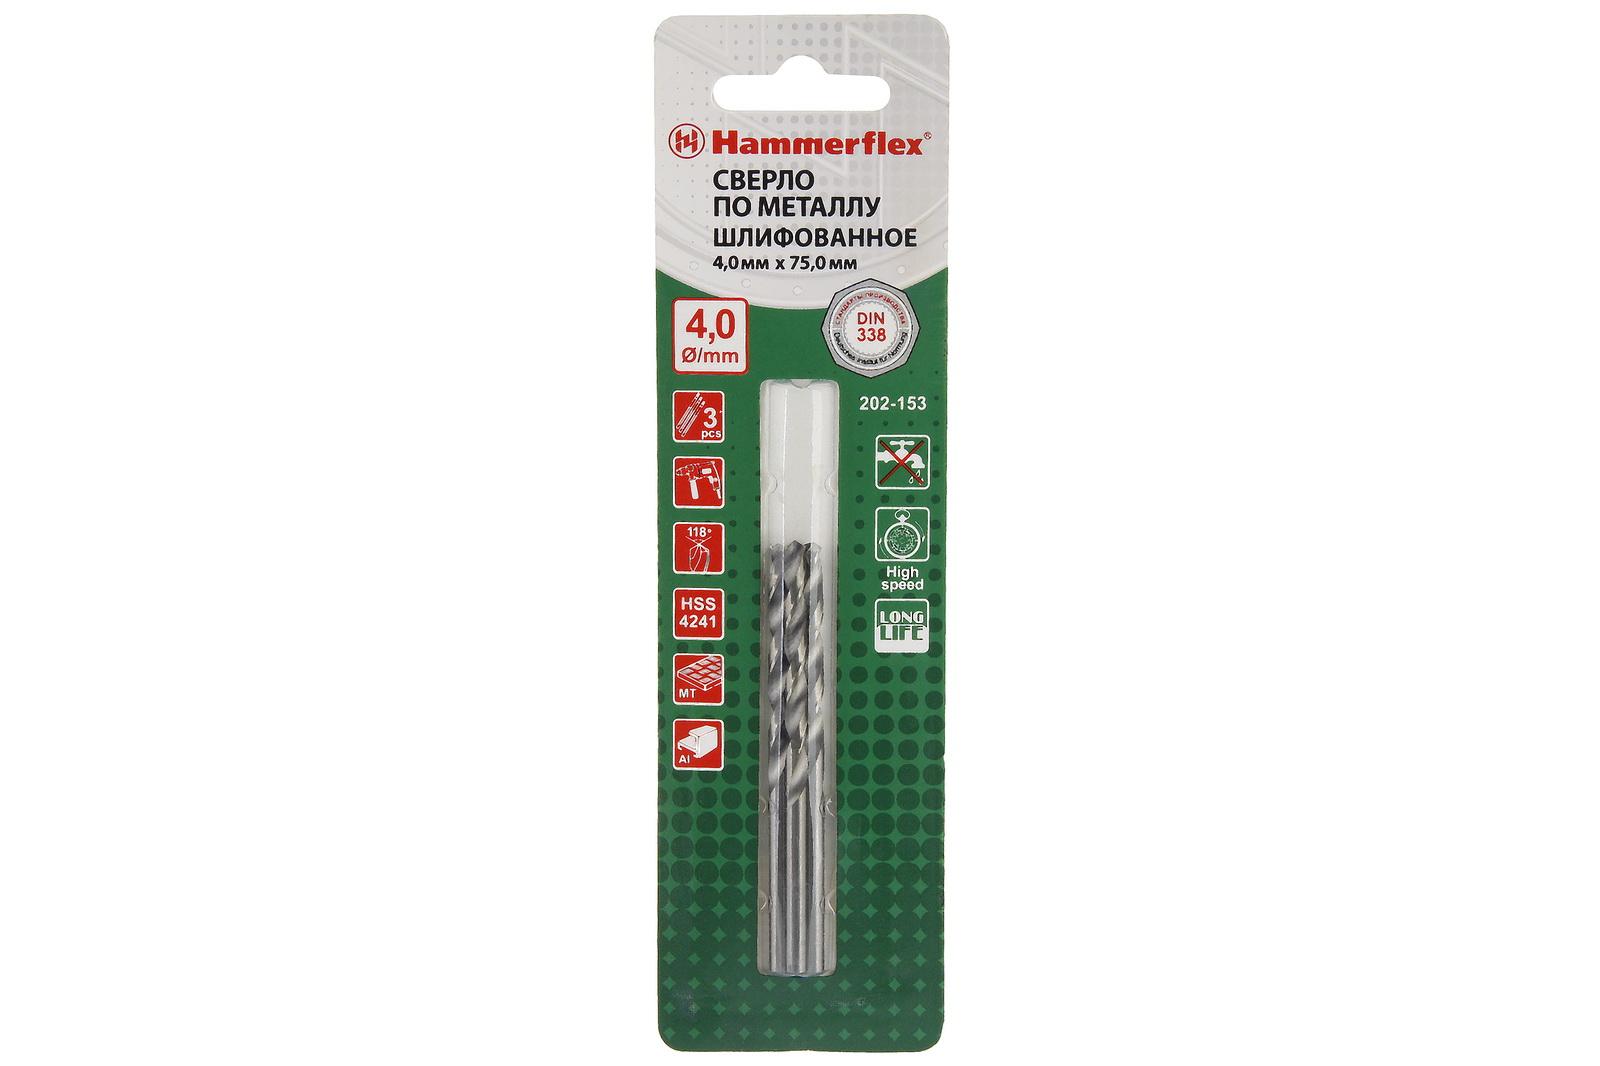 Сверло по металлу Hammer 202-153 dr mt 4,0мм*75 сверло по металлу hammer dr mt 4 0мм 75мм